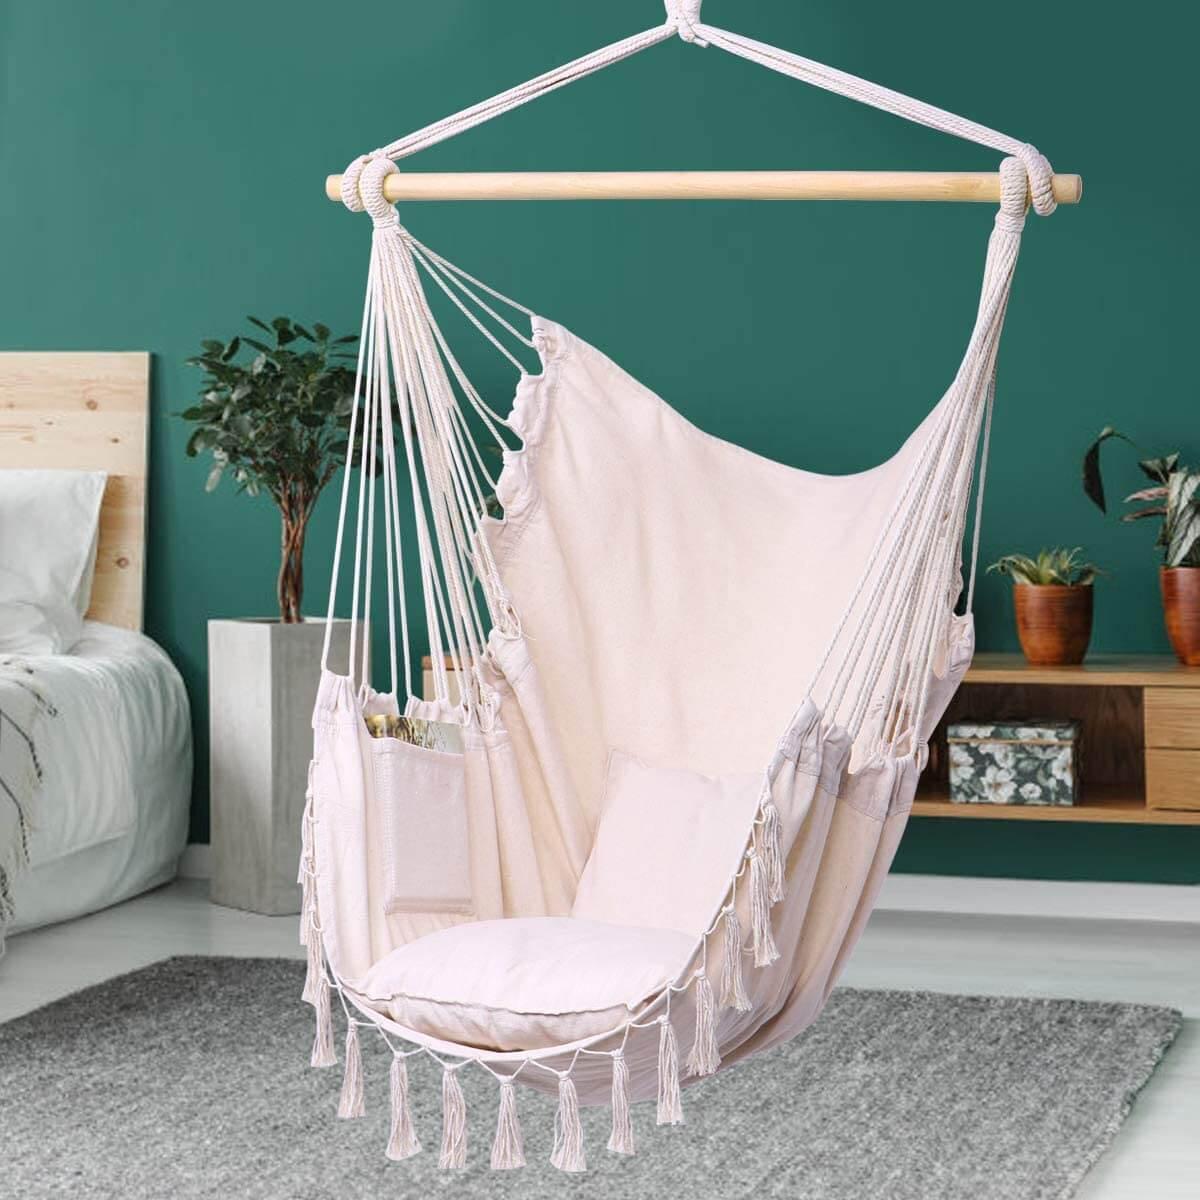 Boho Themed Hammock Swing Chair